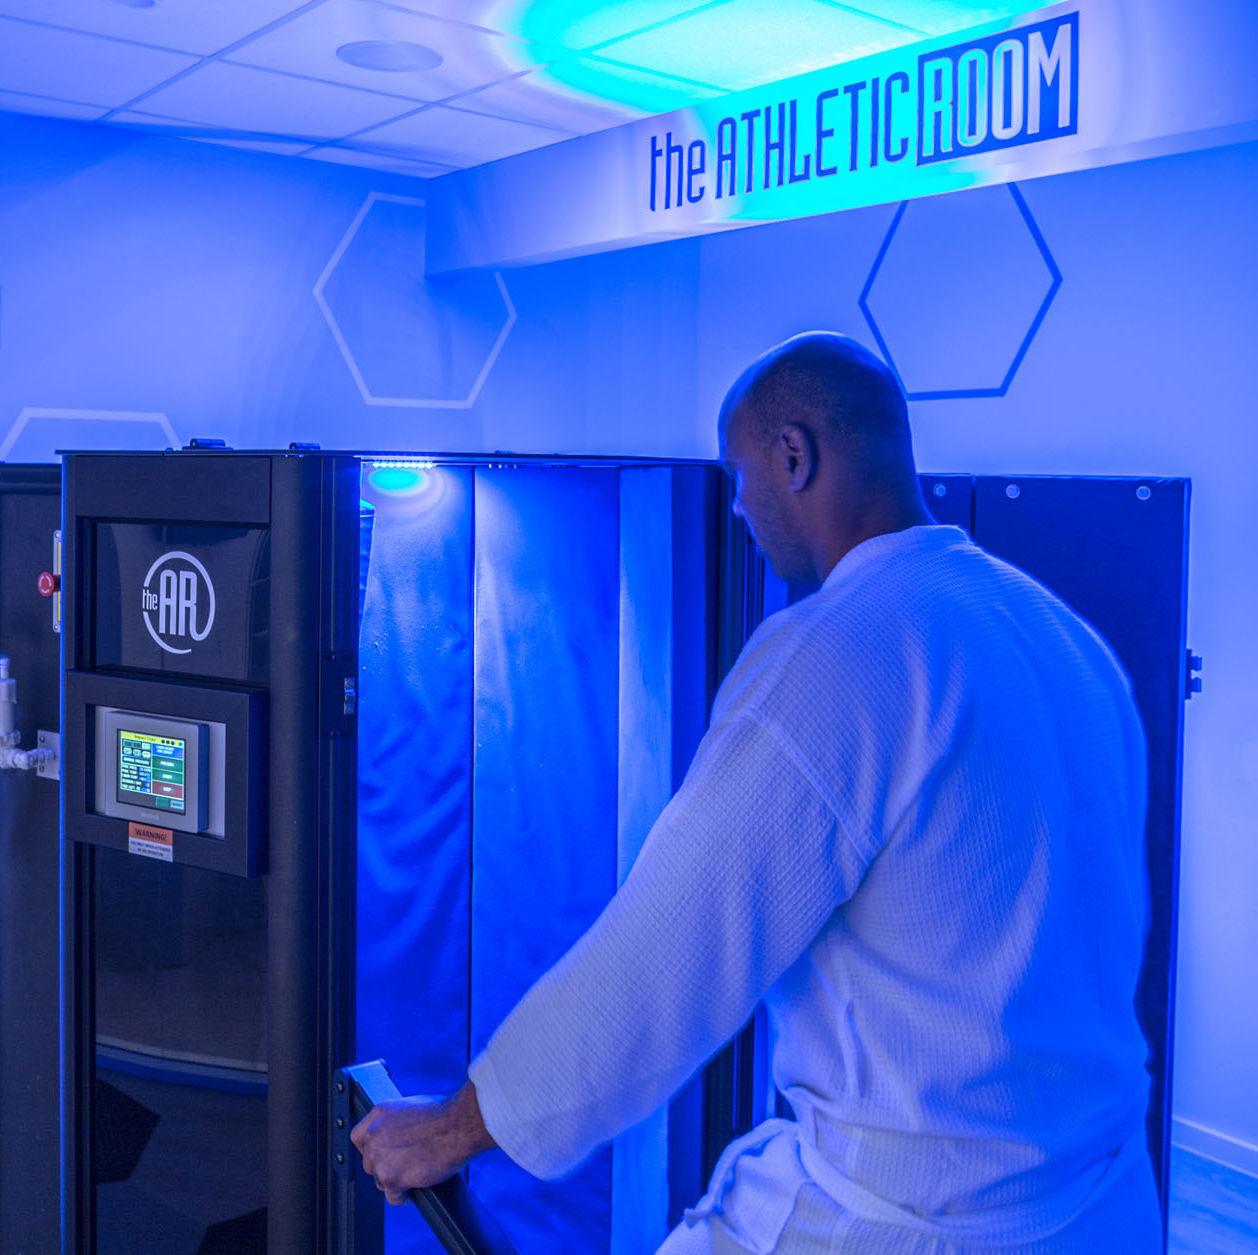 Cryotherapy room qan6fg